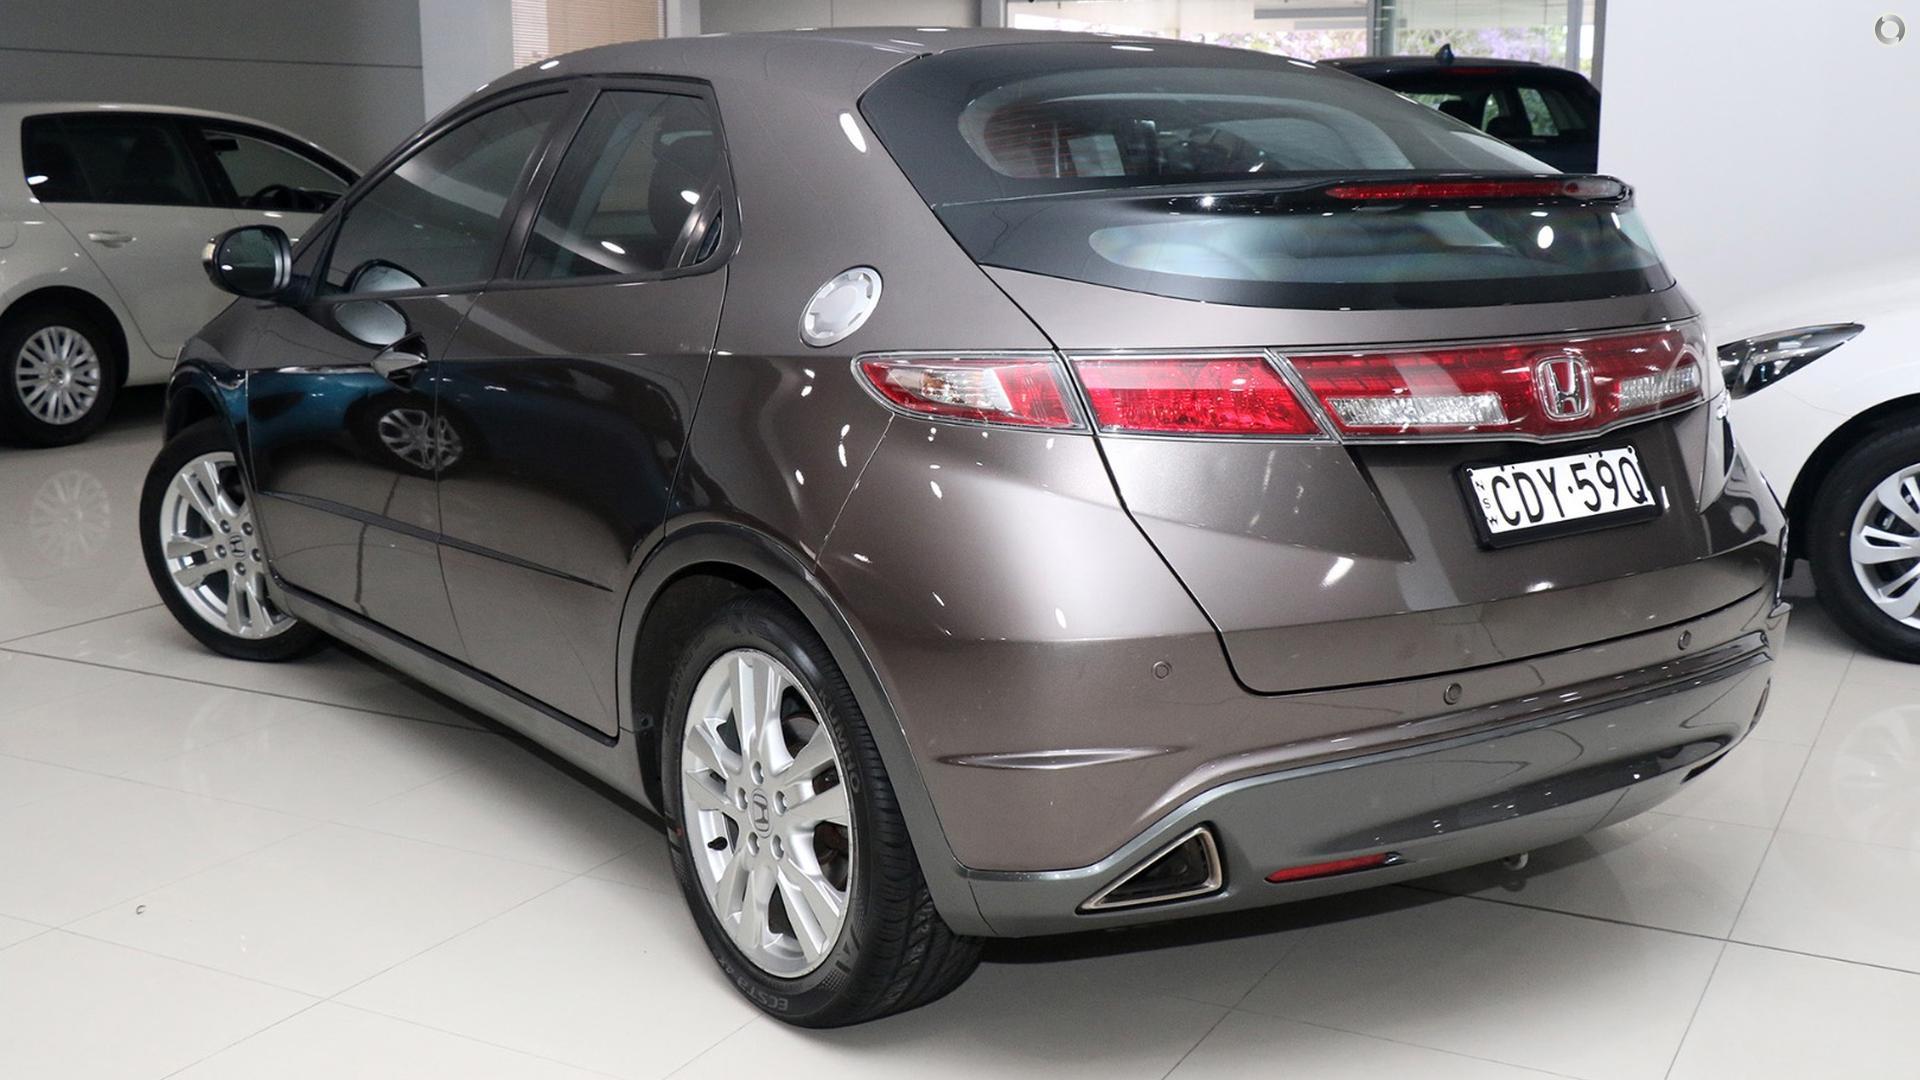 2011 Honda Civic Si 8th Gen